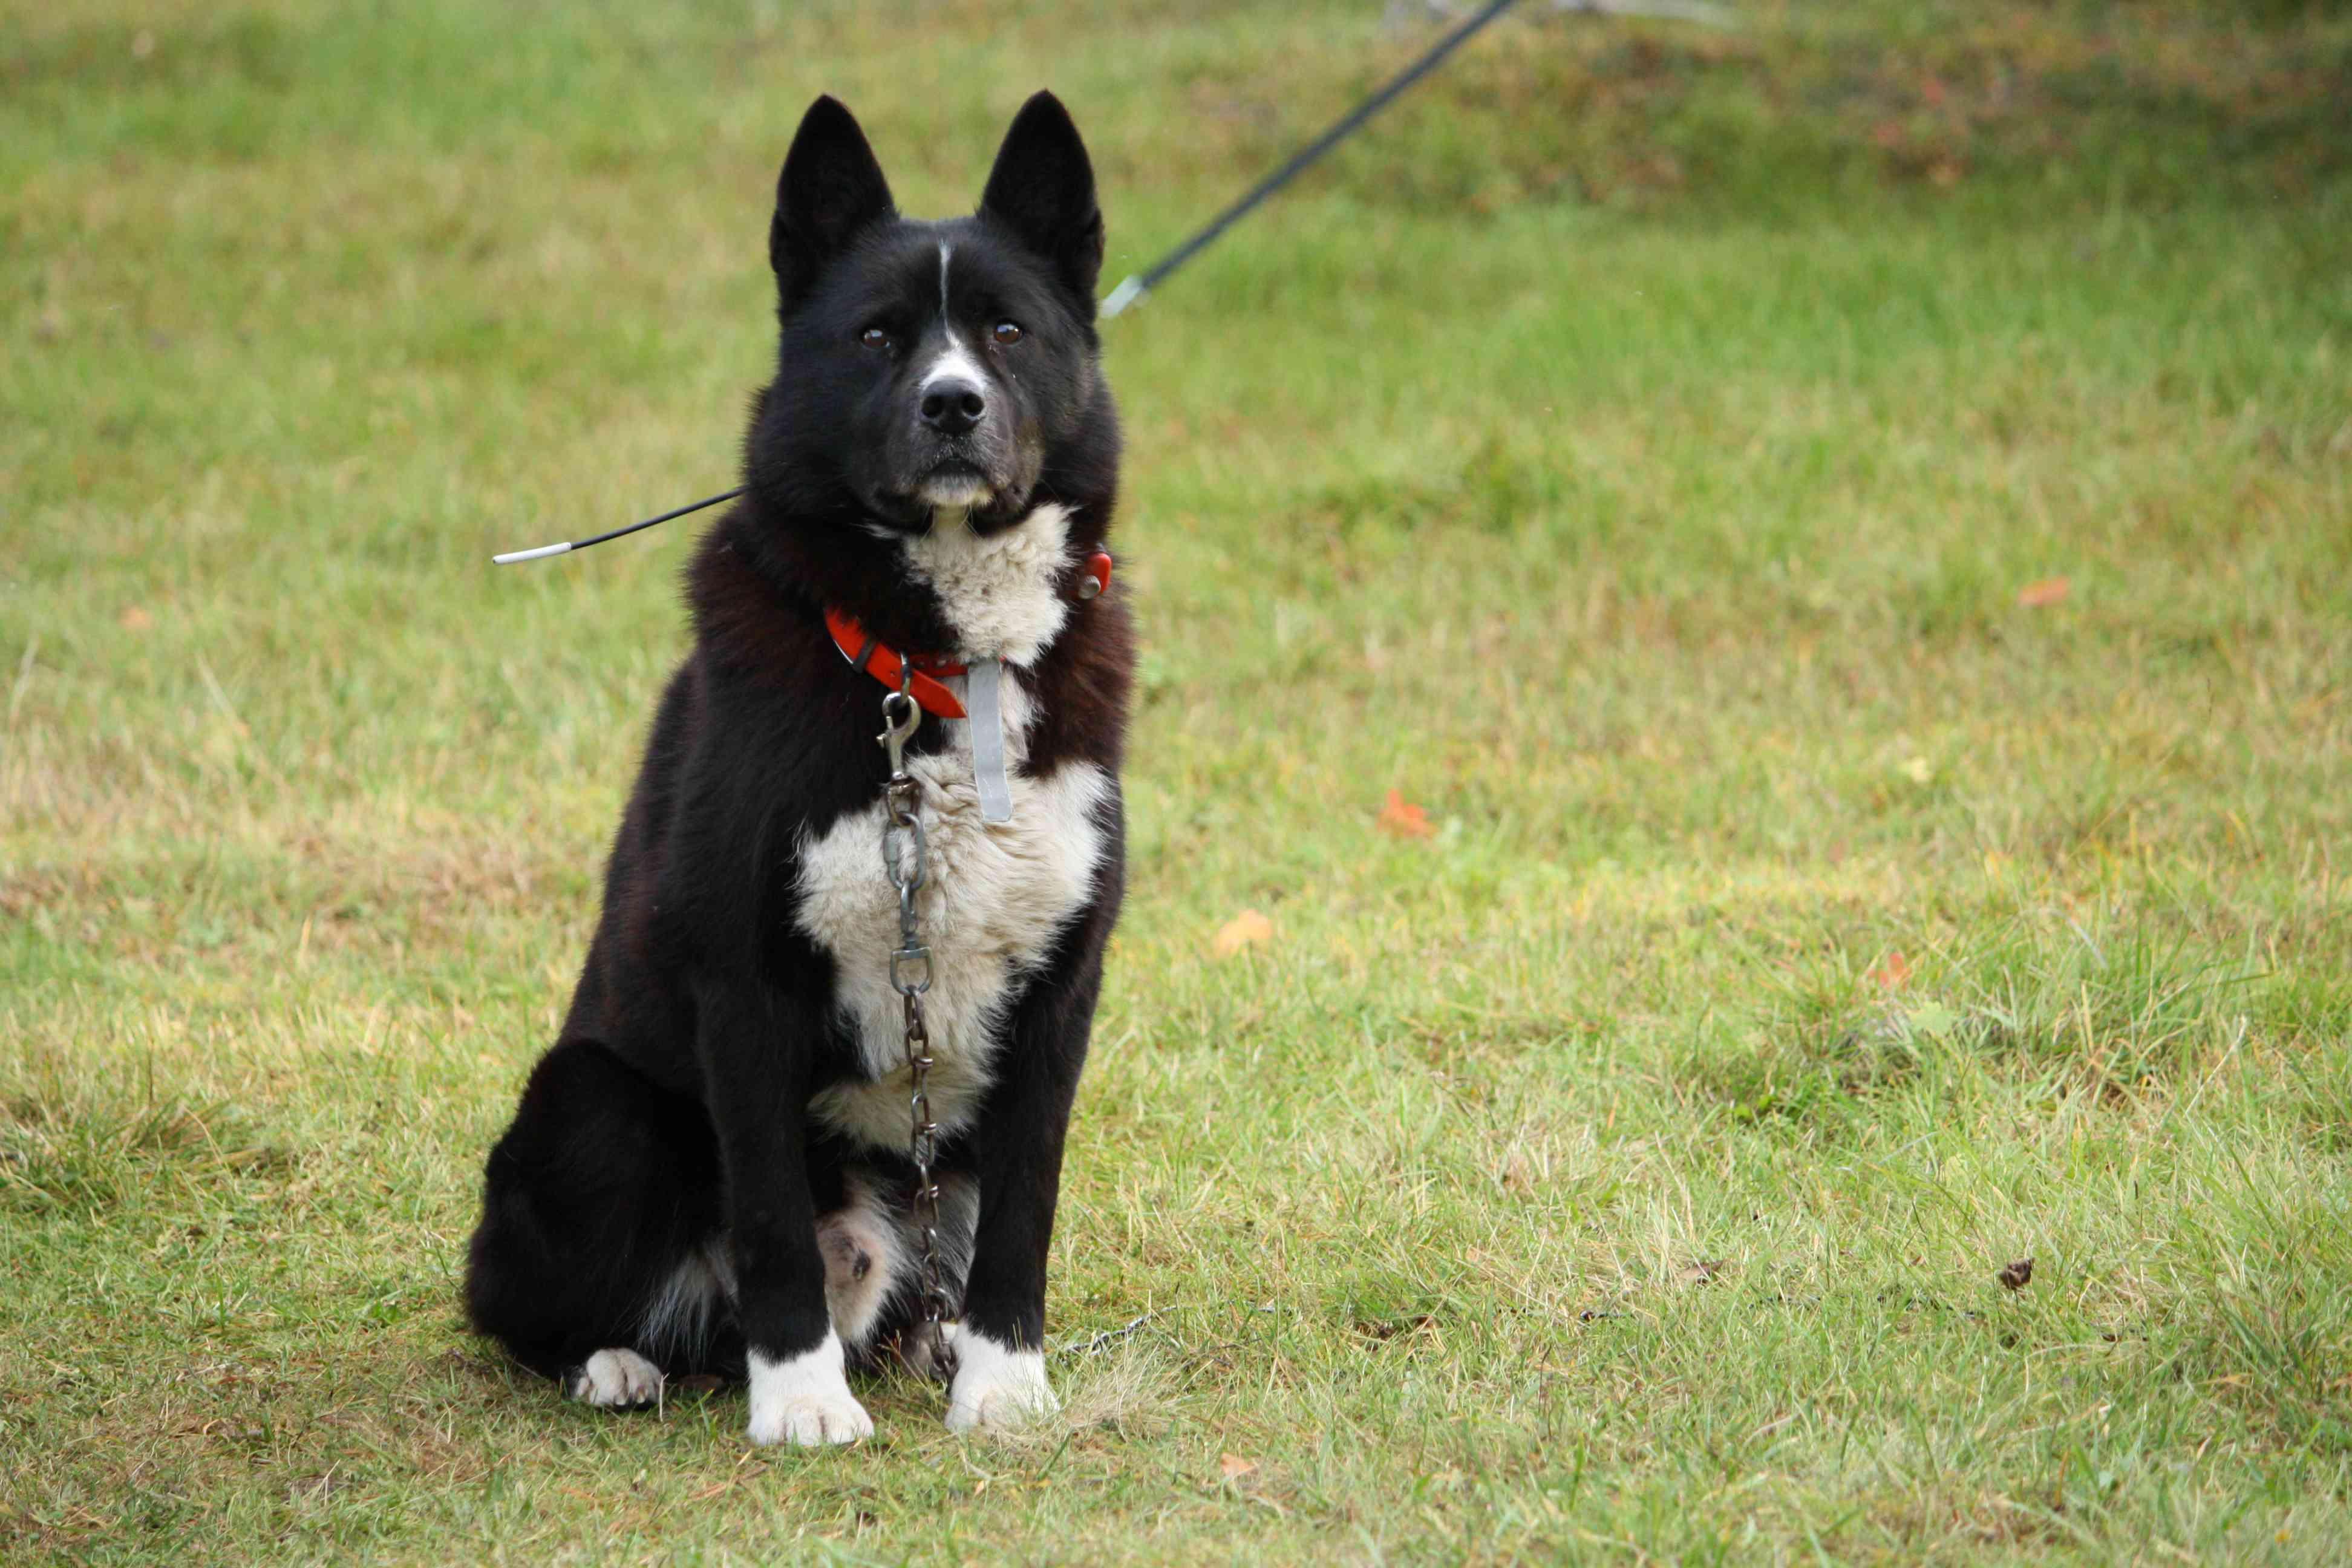 Karelian bear dog standing